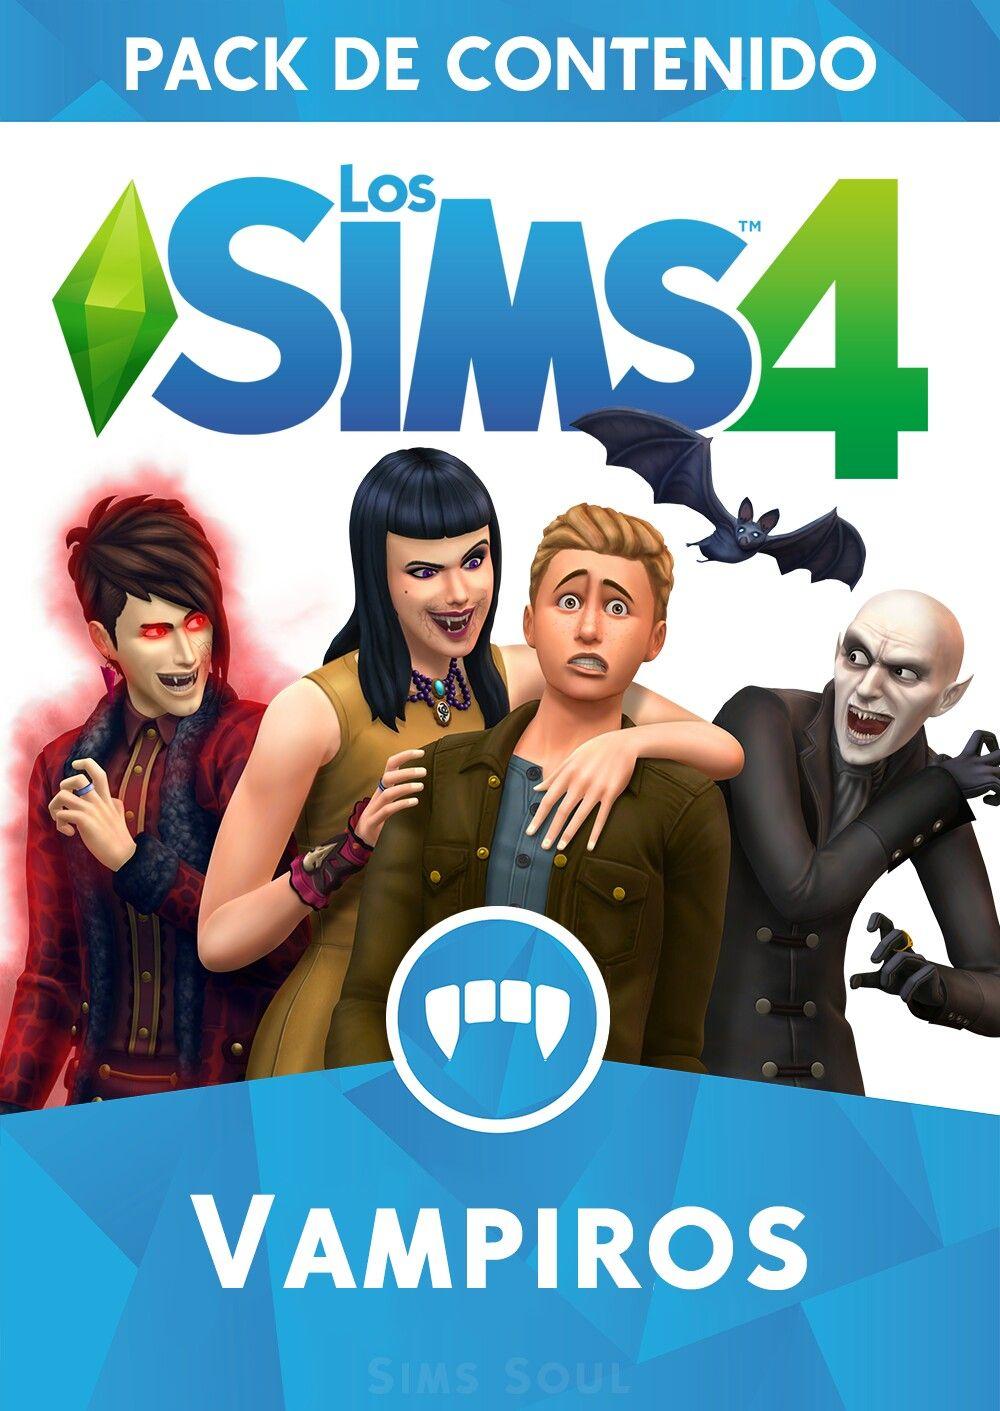 Los Sims 4 Vampiros Pack De Contenido Sims 4 Expansiones Sims Sims 4